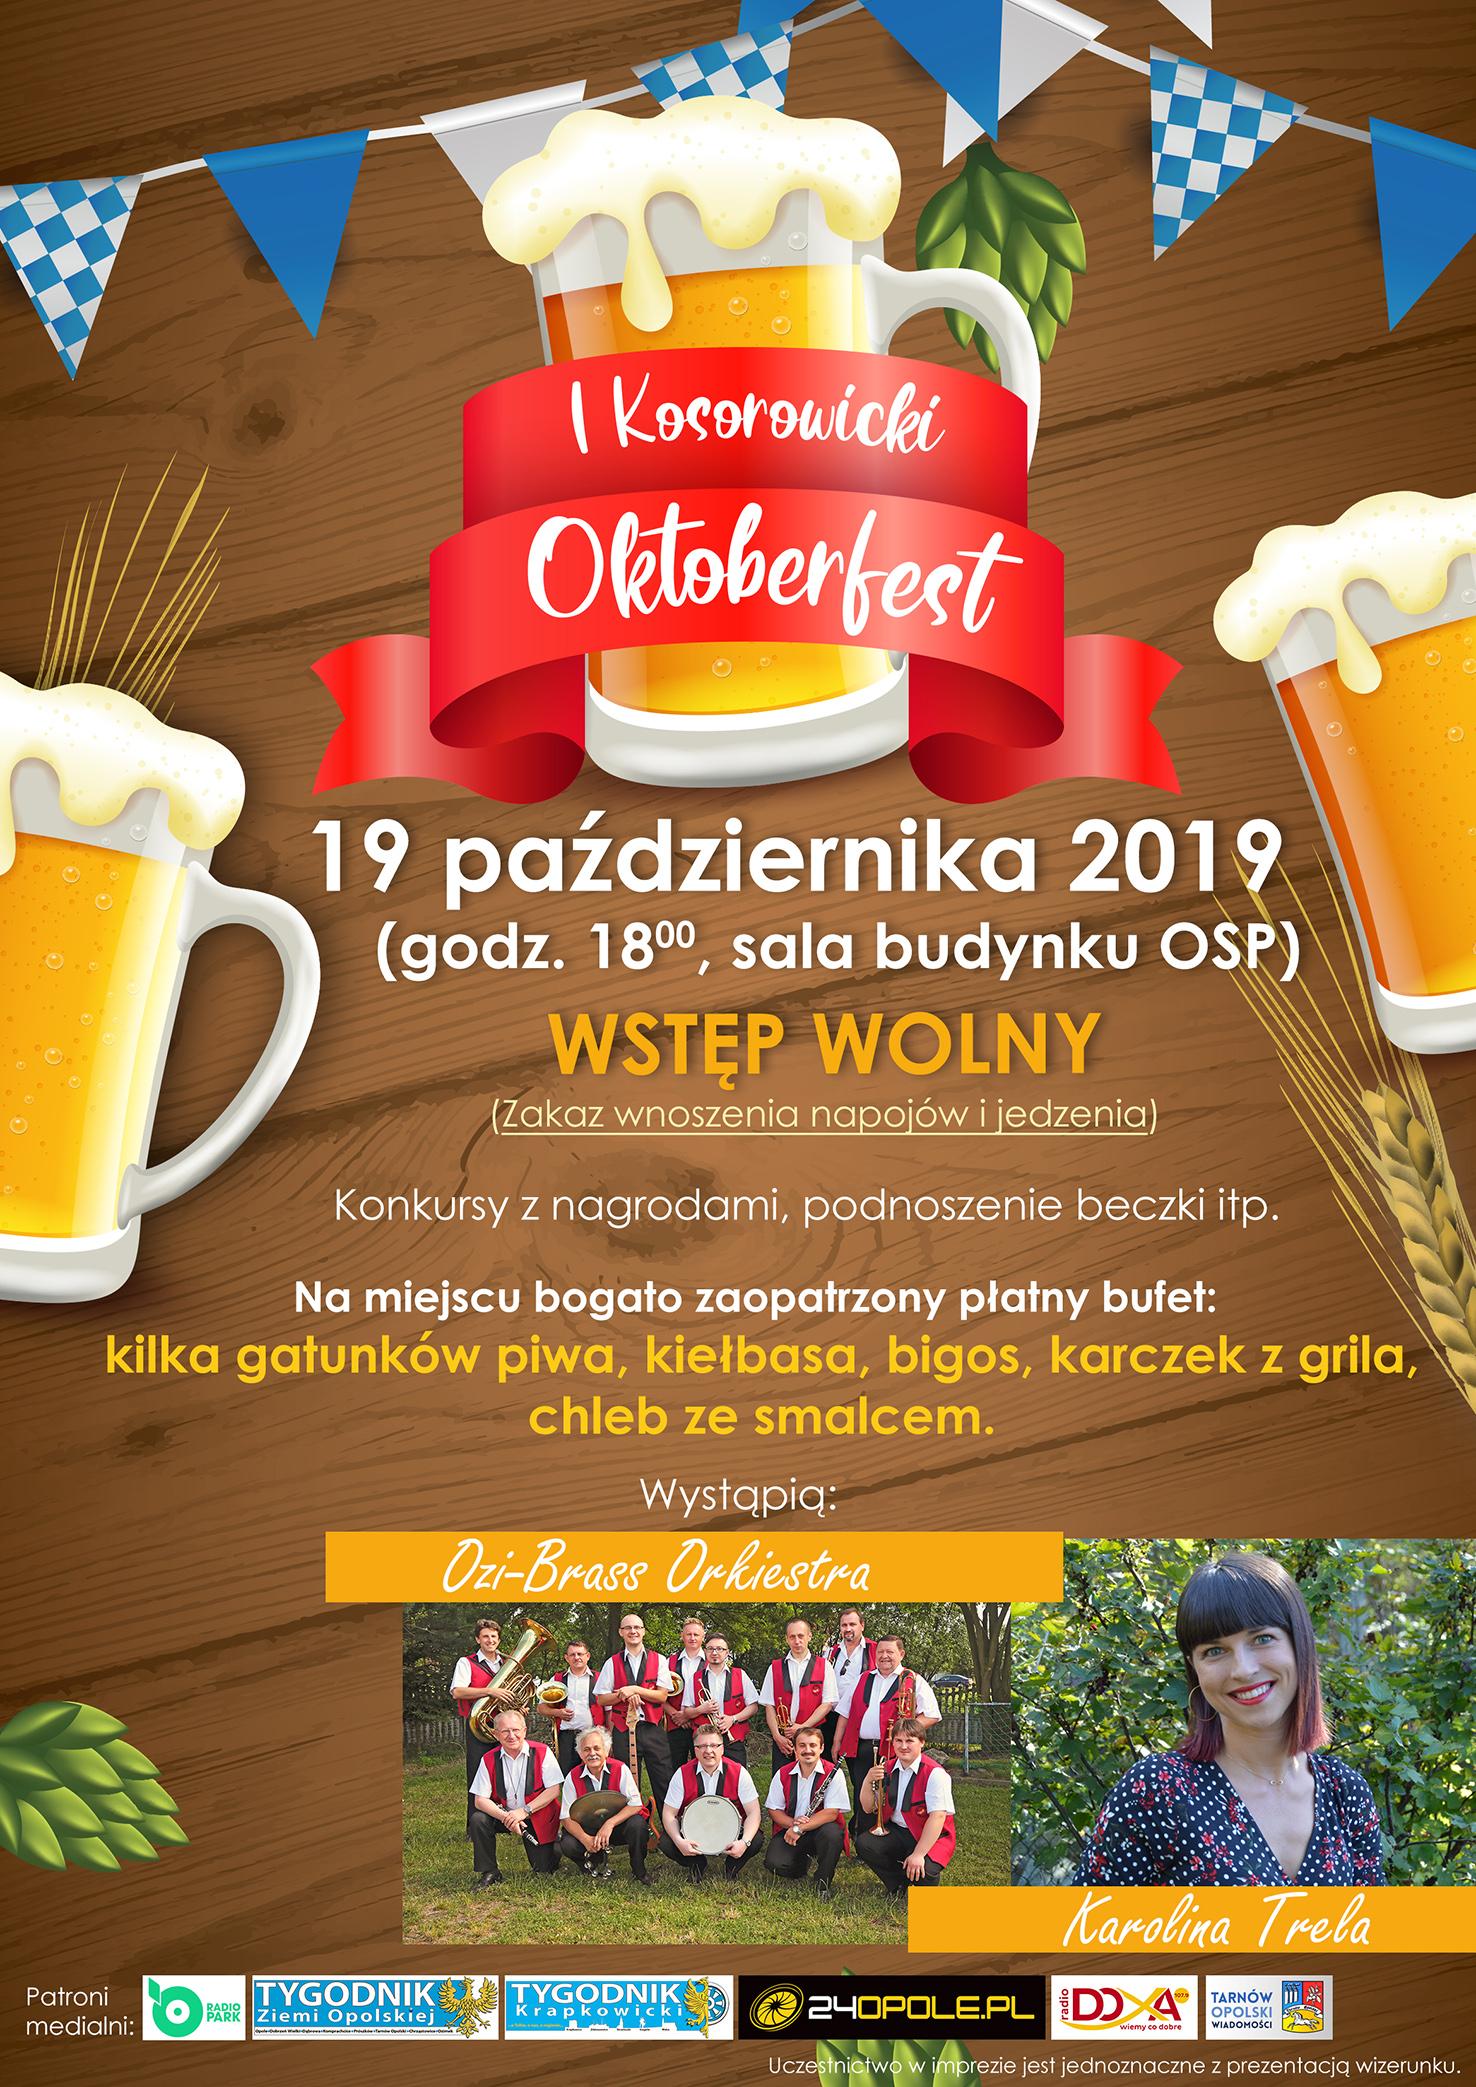 I Kosorowicki Oktoberfest PLAKAT